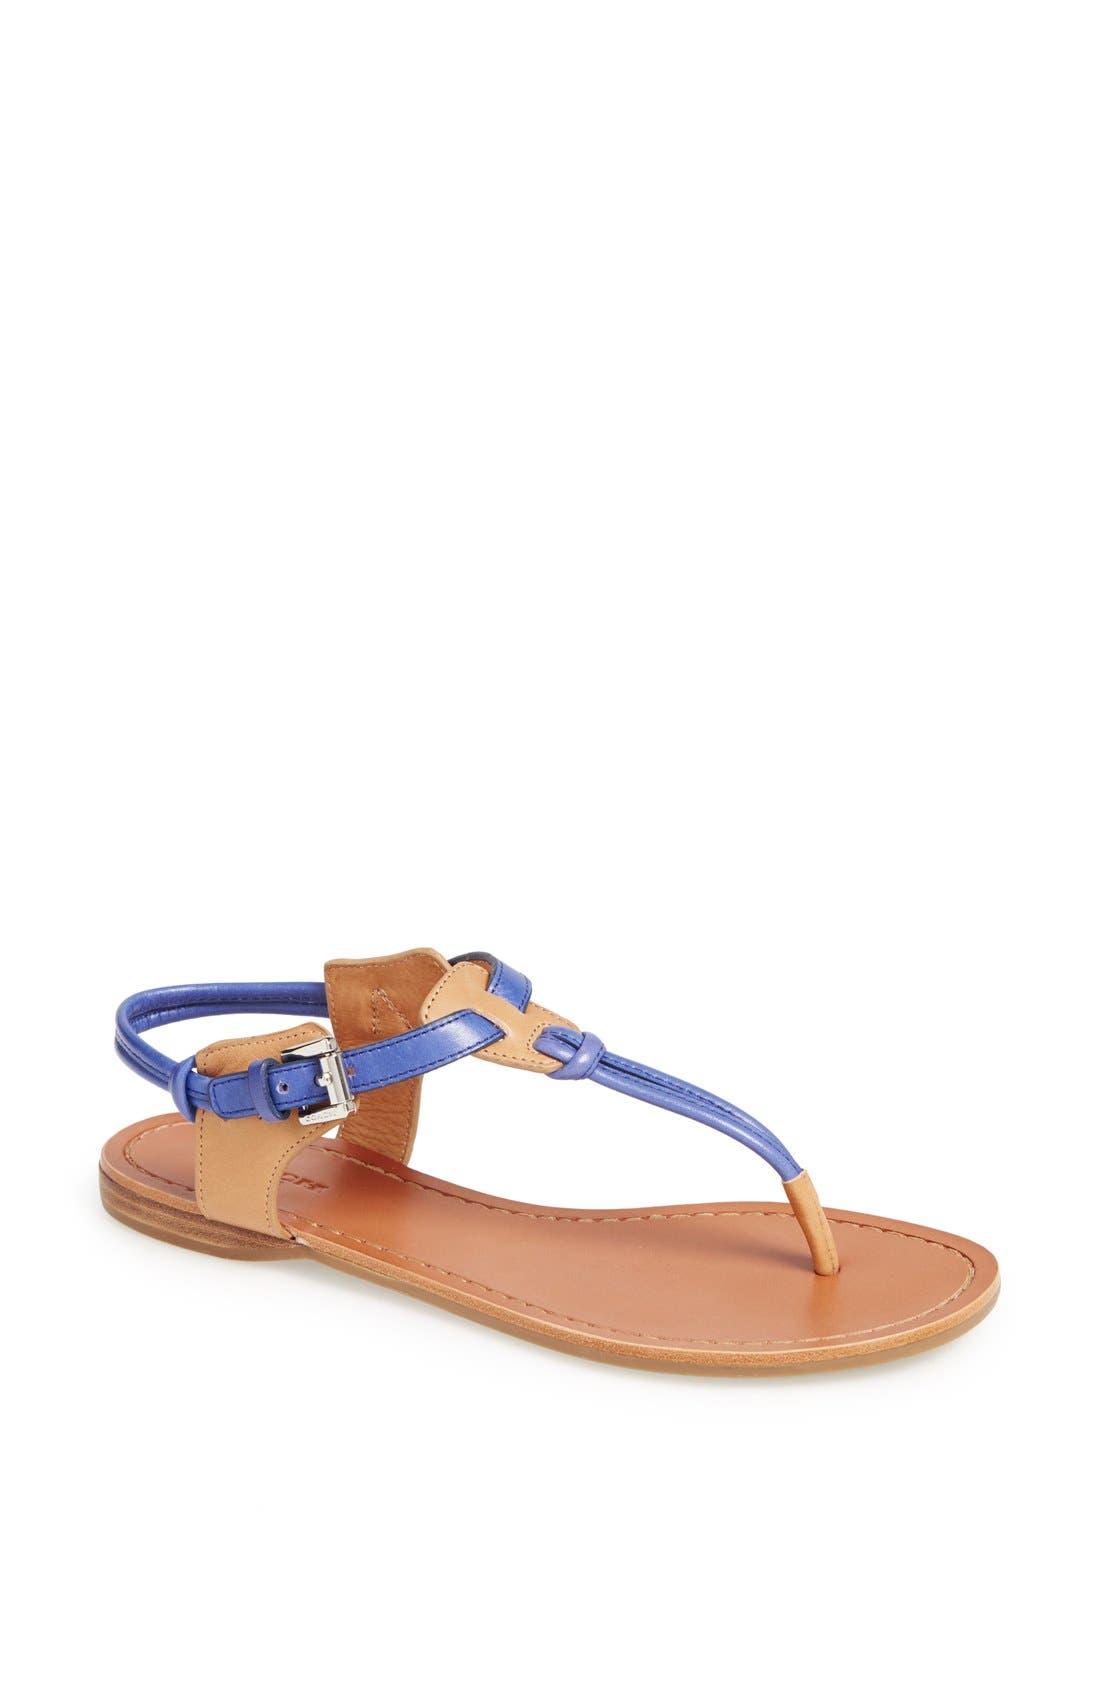 Main Image - COACH 'Clarkson' Sandal